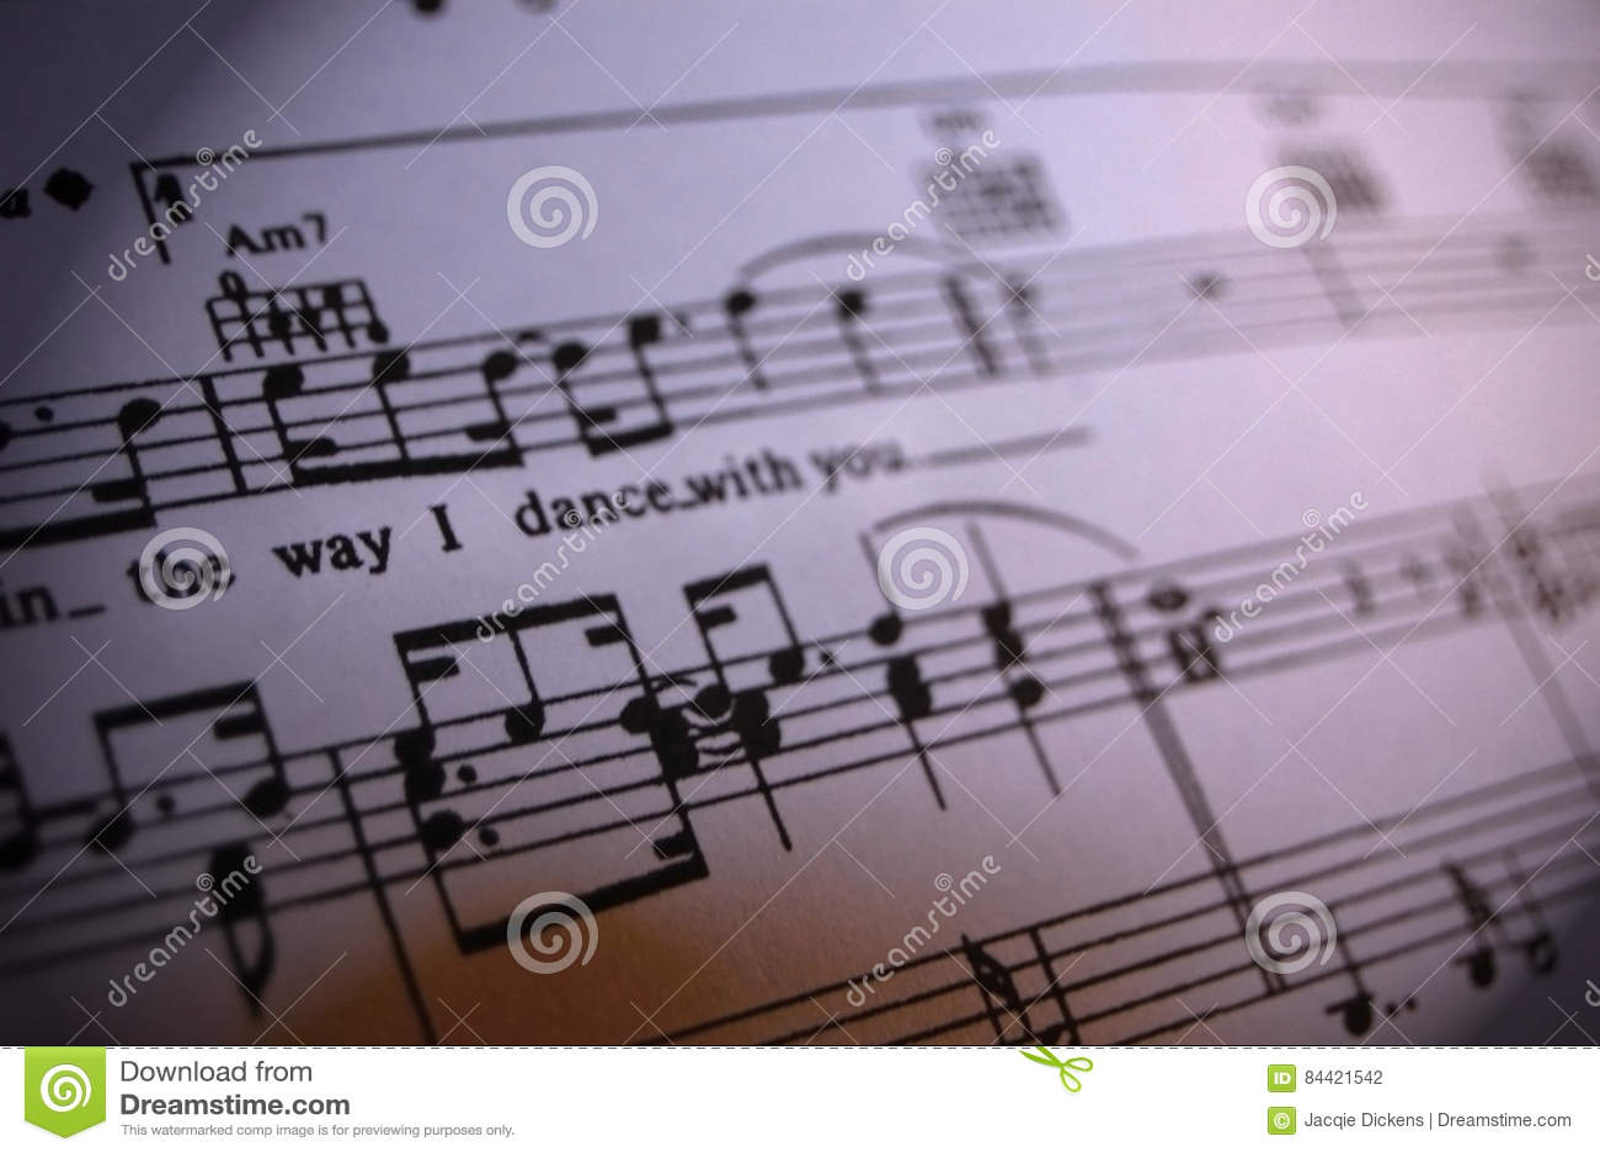 MUSICA WHISPER GRATUITO GRATIS DOWNLOAD CARELESS A